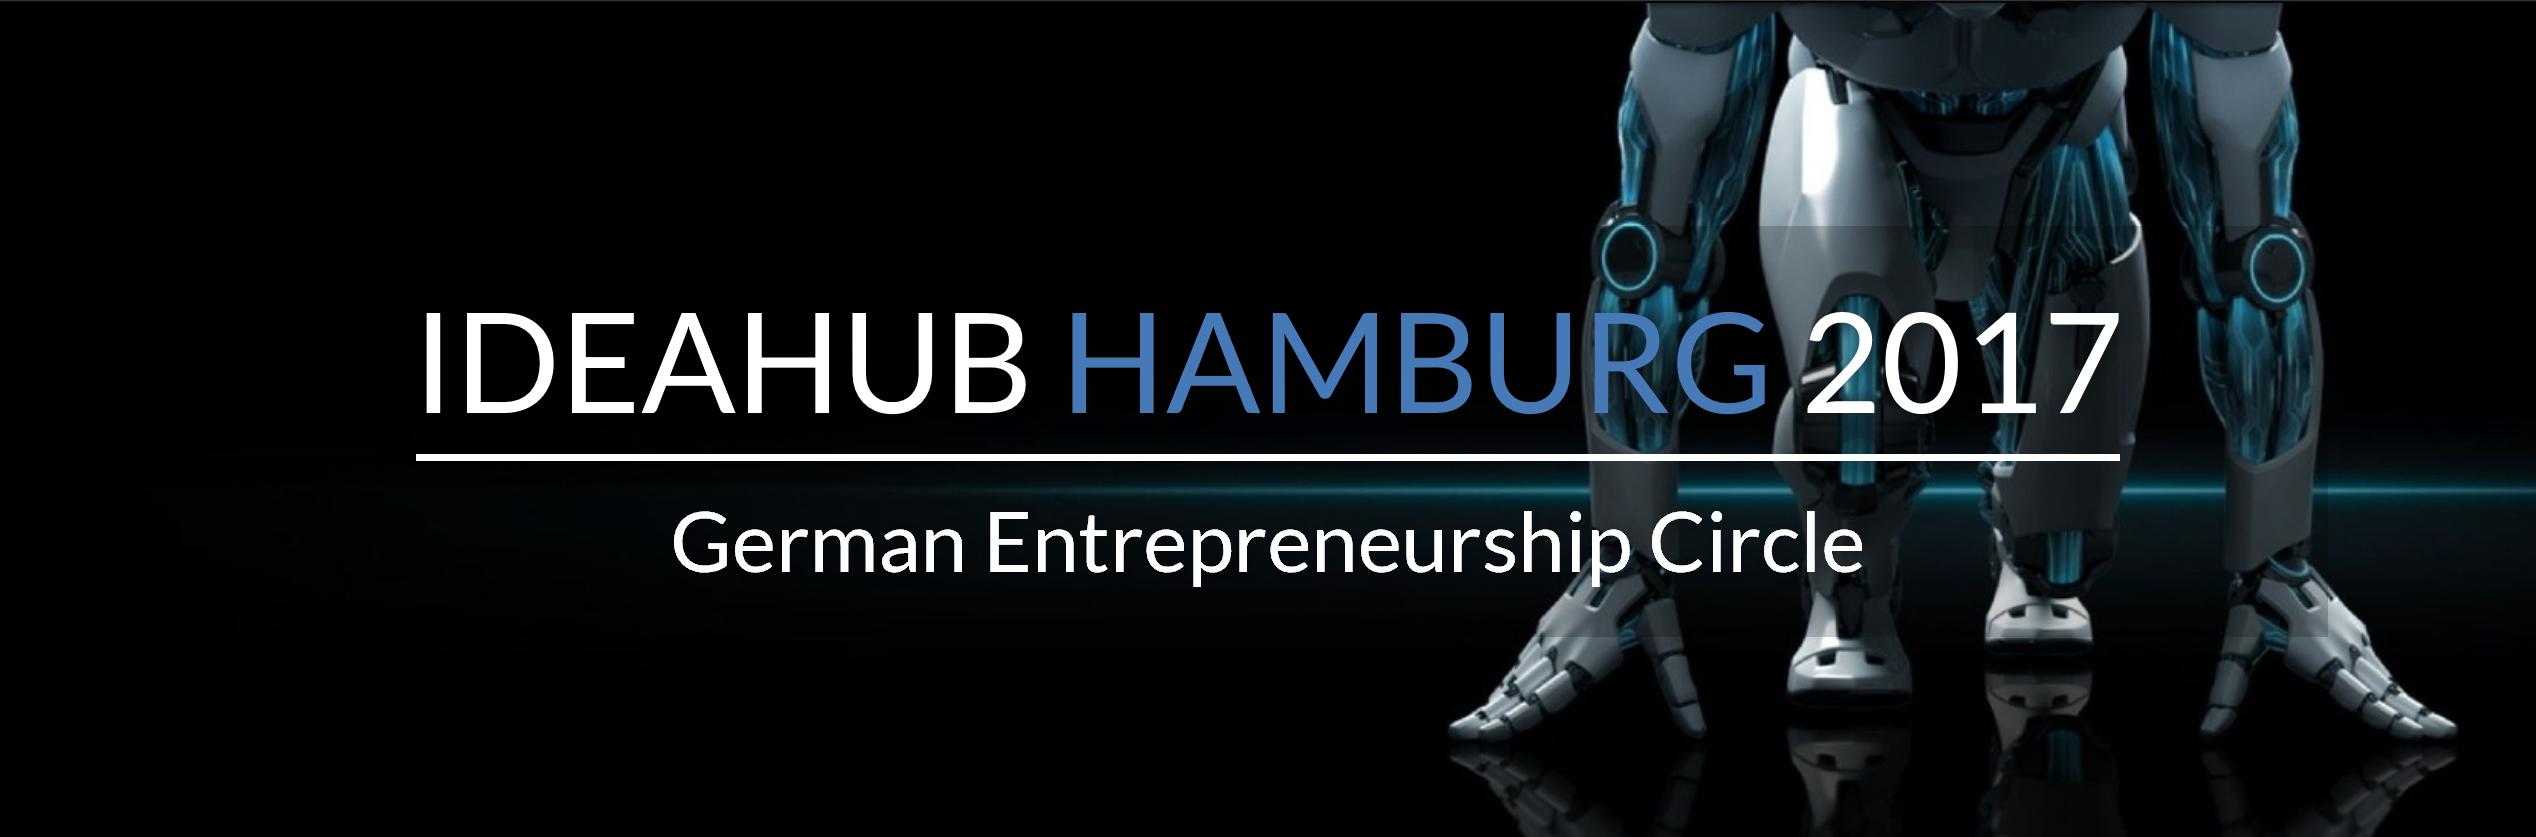 GEC IdeaHub Healthcare | 19-21 May 2017 Hamburg